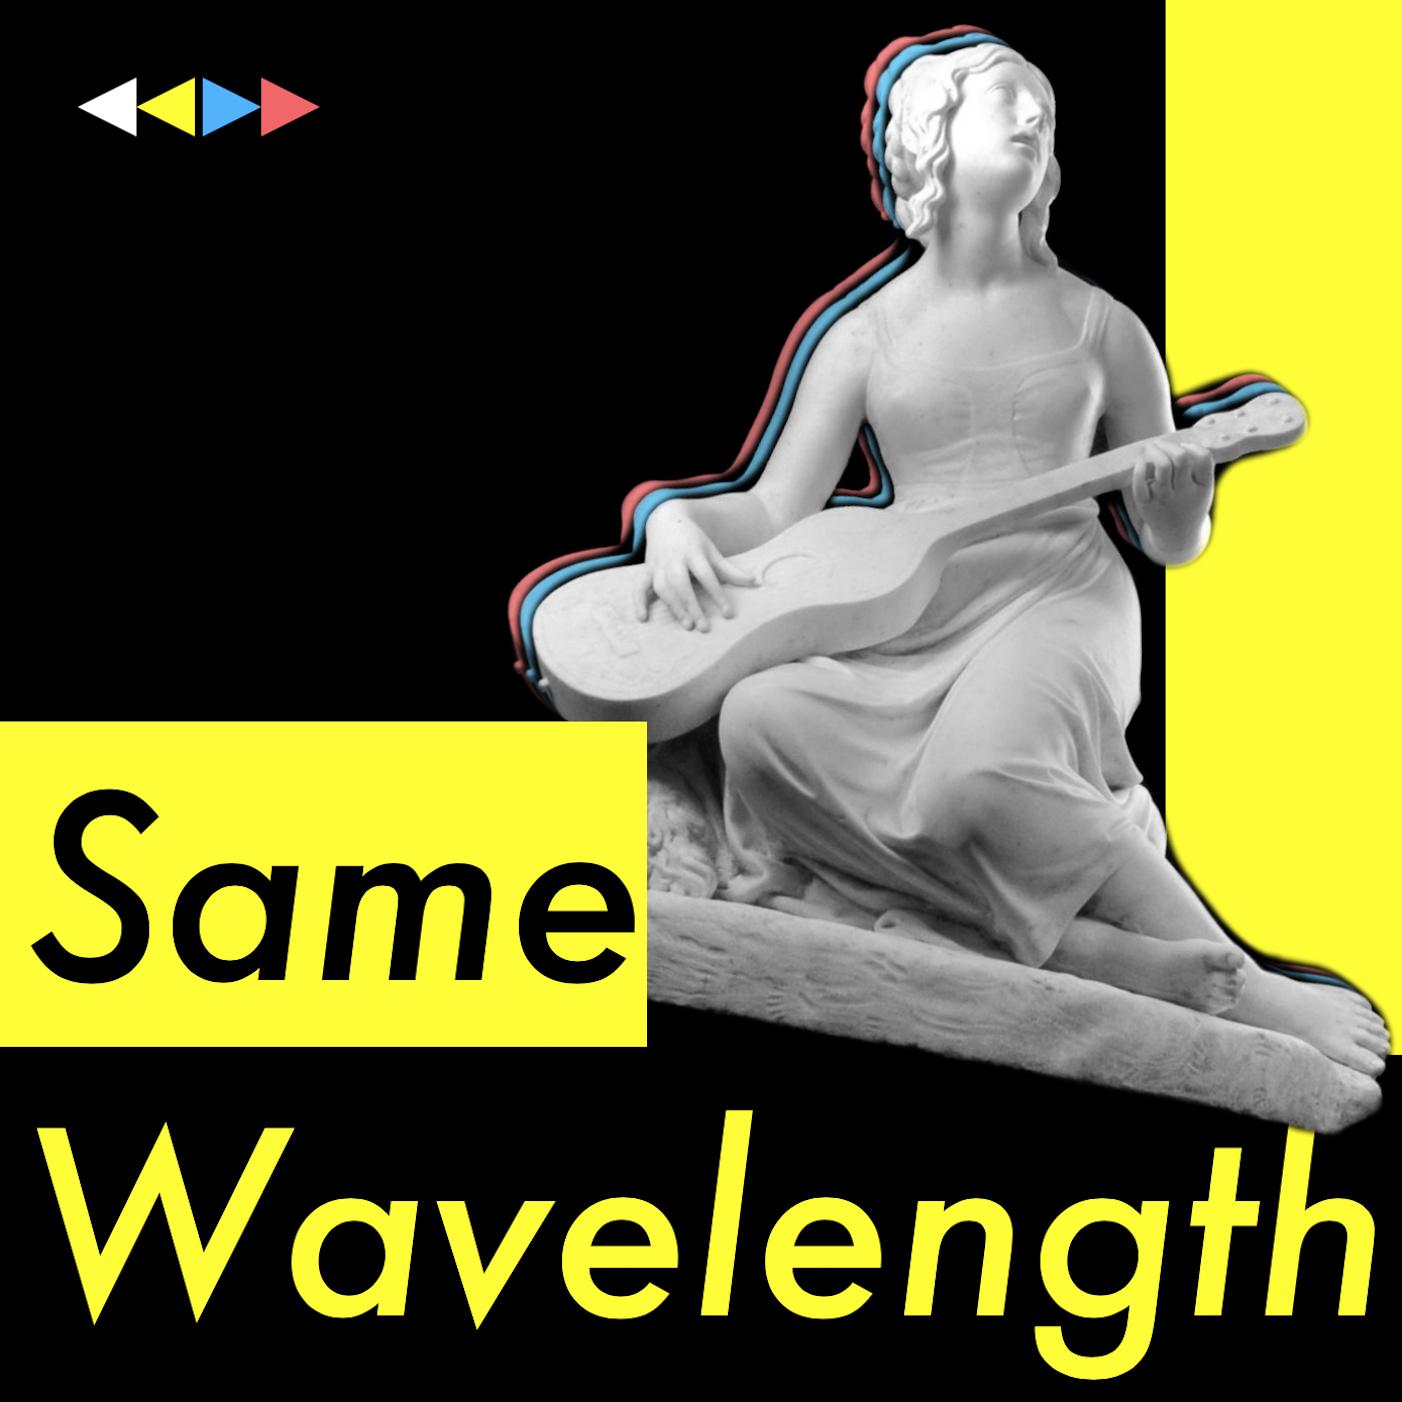 Same Wavelength Preview #1